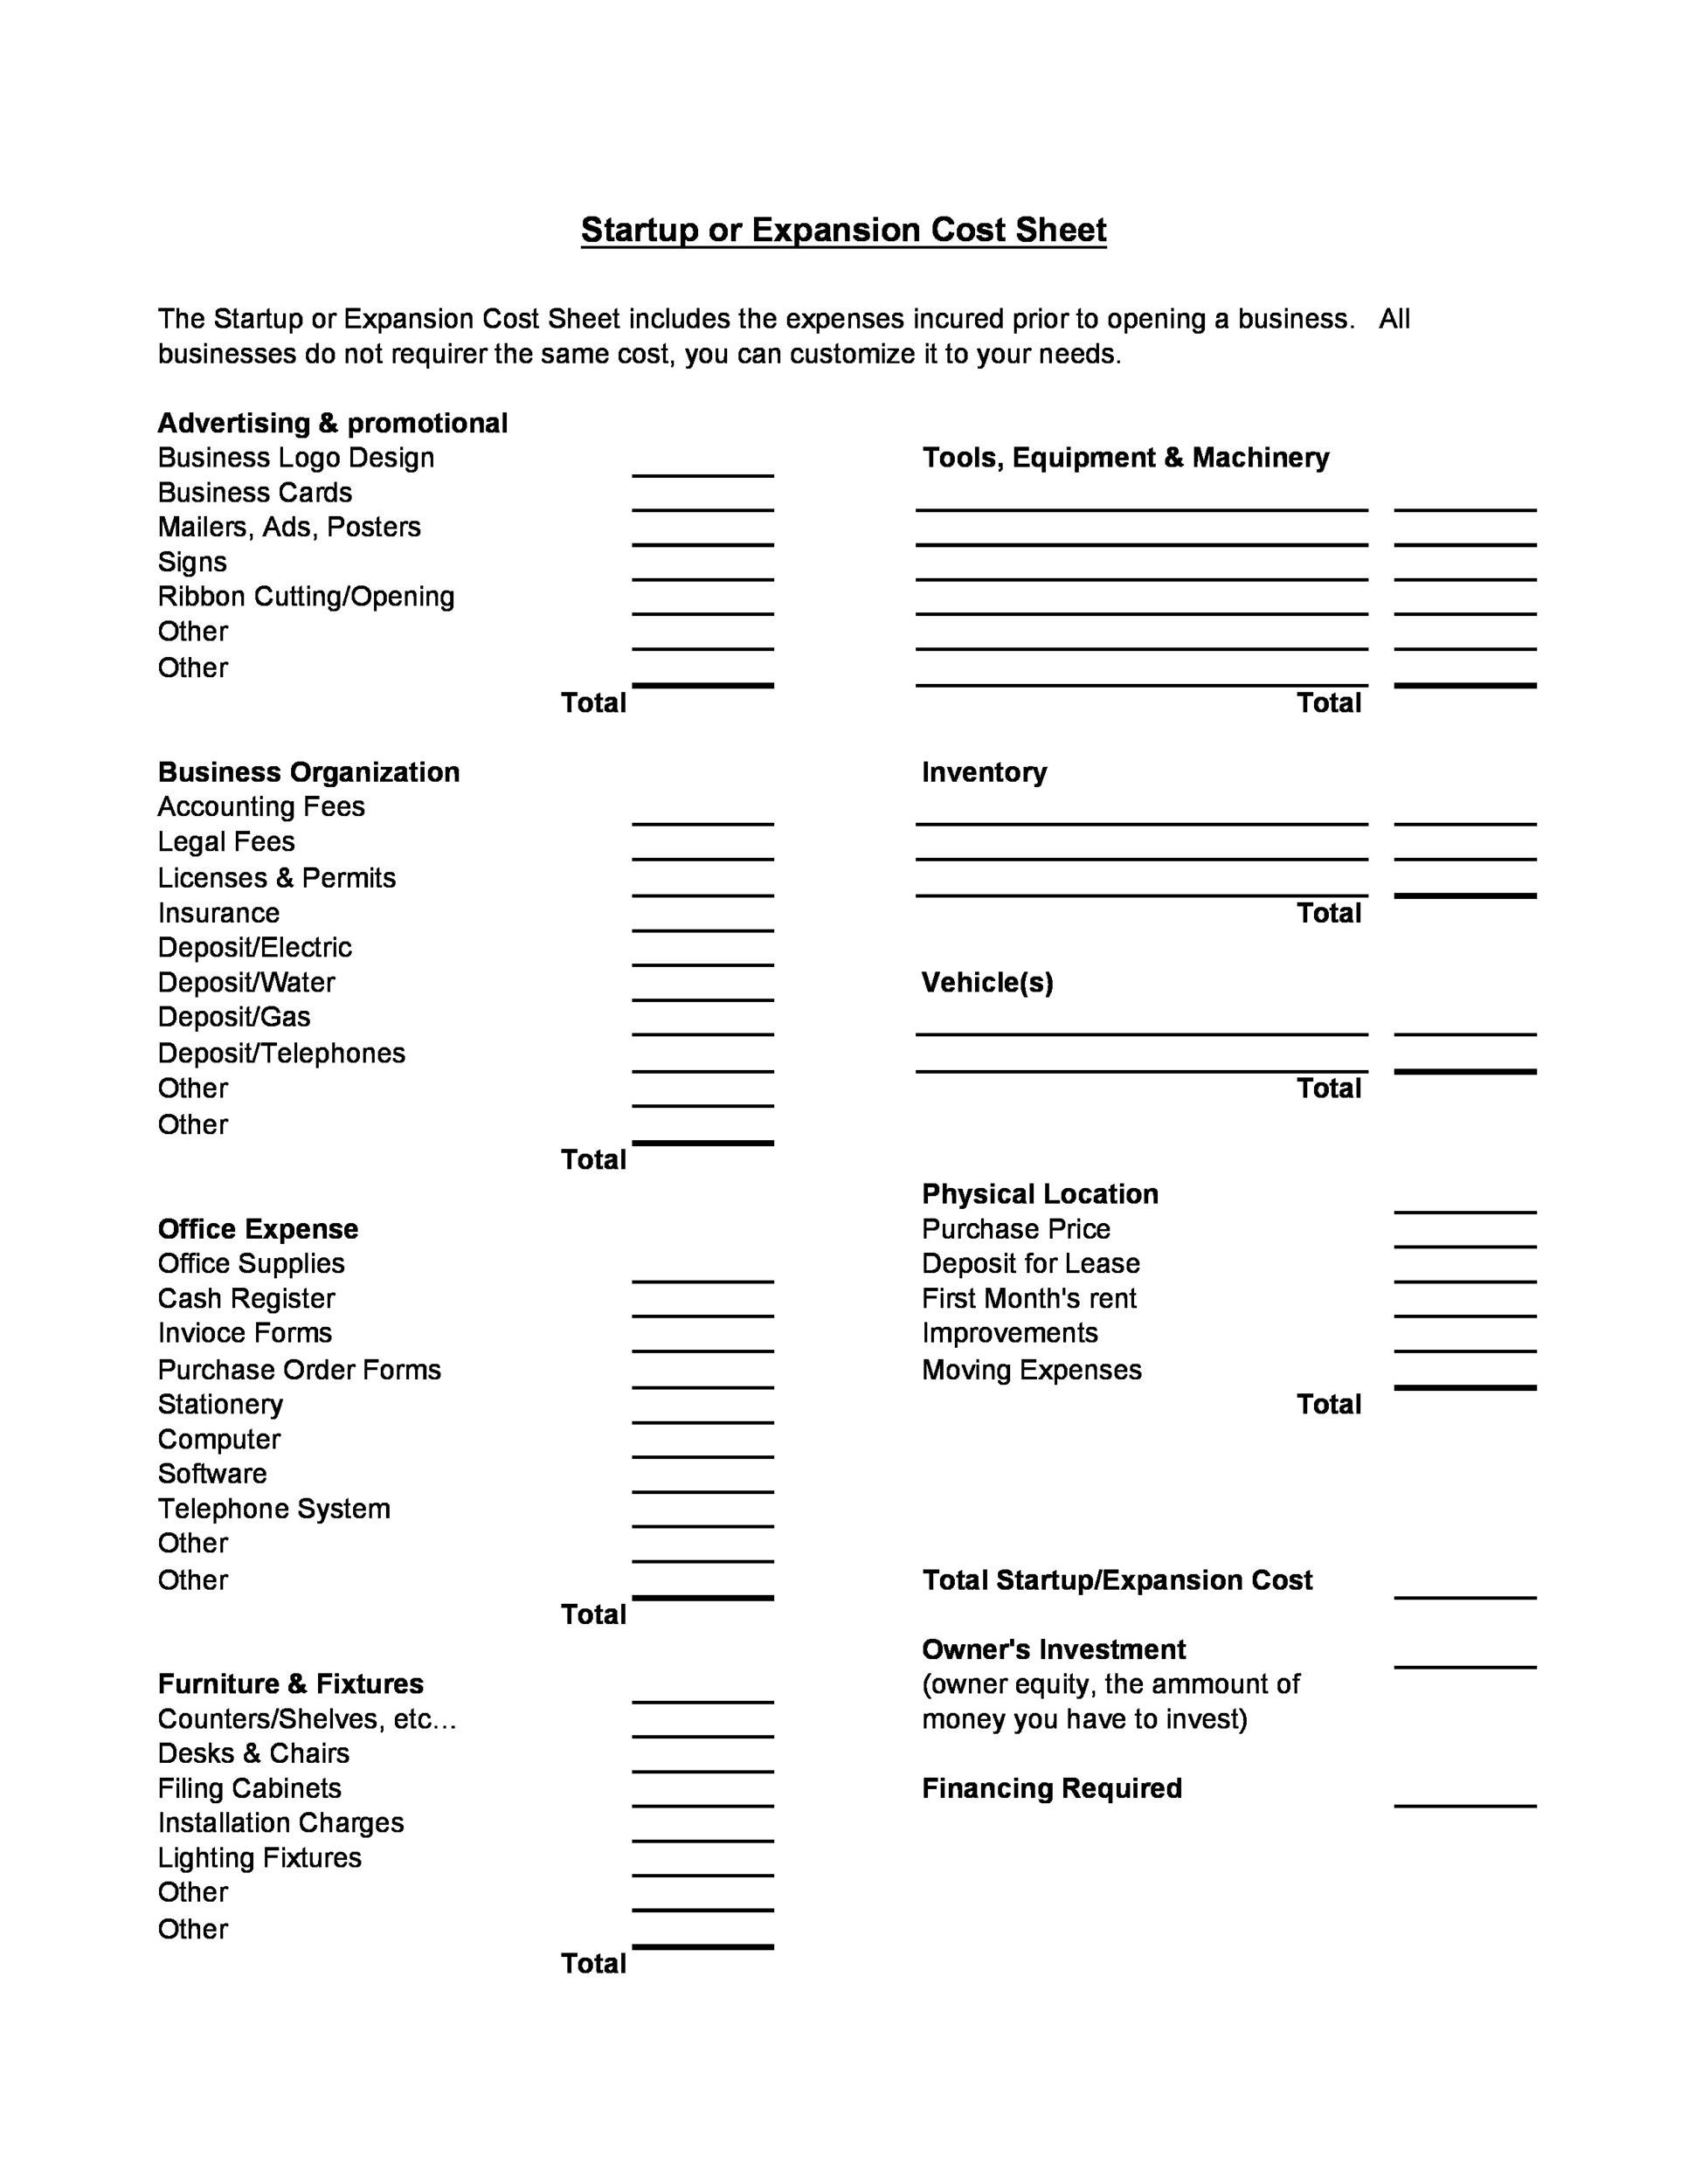 Startup Cost Worksheet